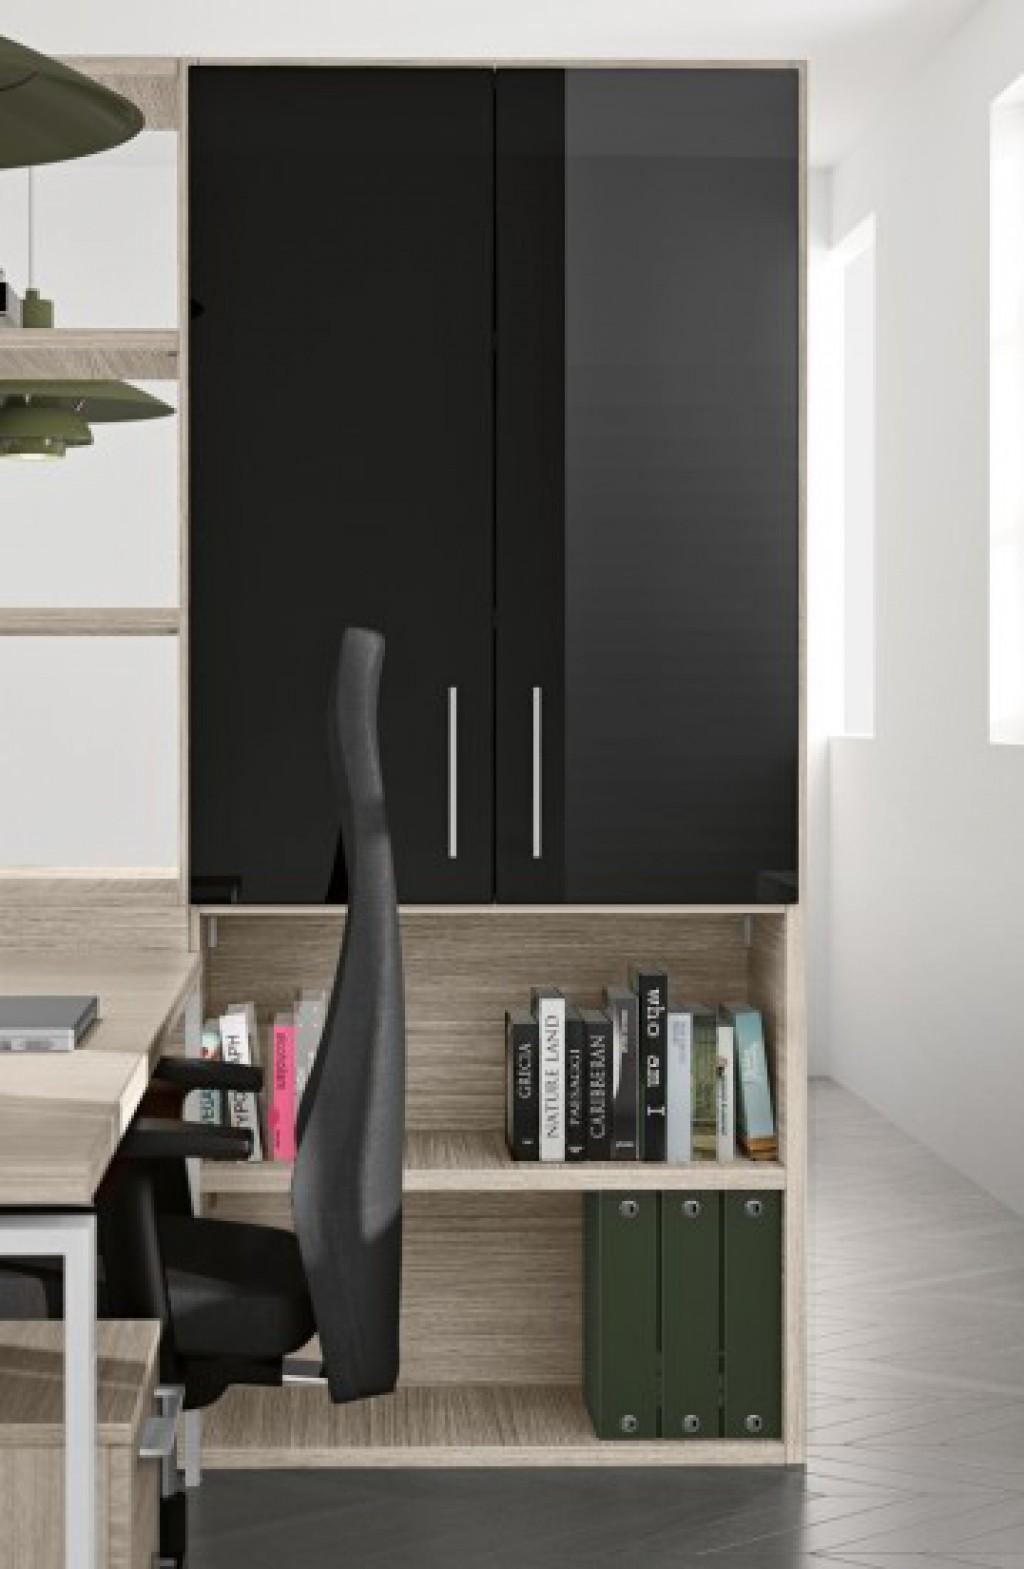 Armadio moderno oc ar9 cucine mobili di qualit al for Mobili cucine qualita